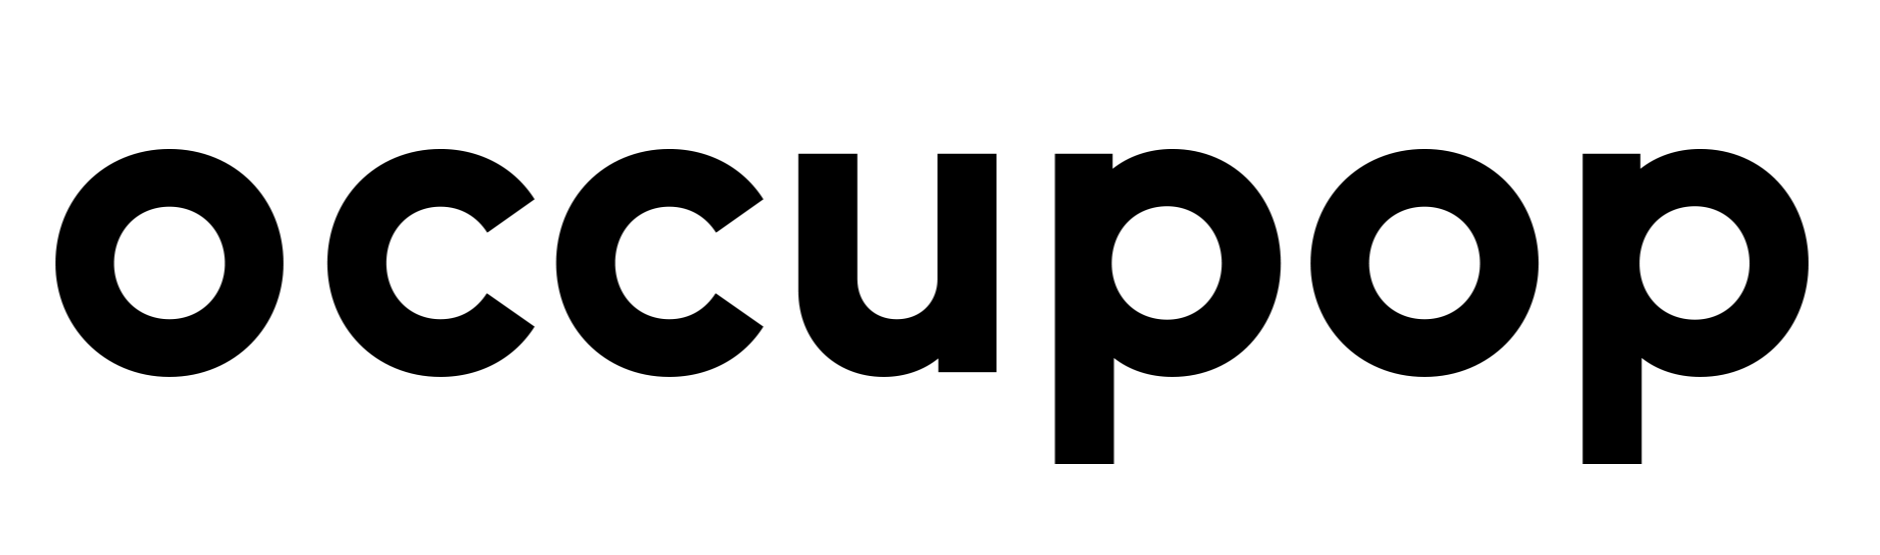 occupop black-1-1